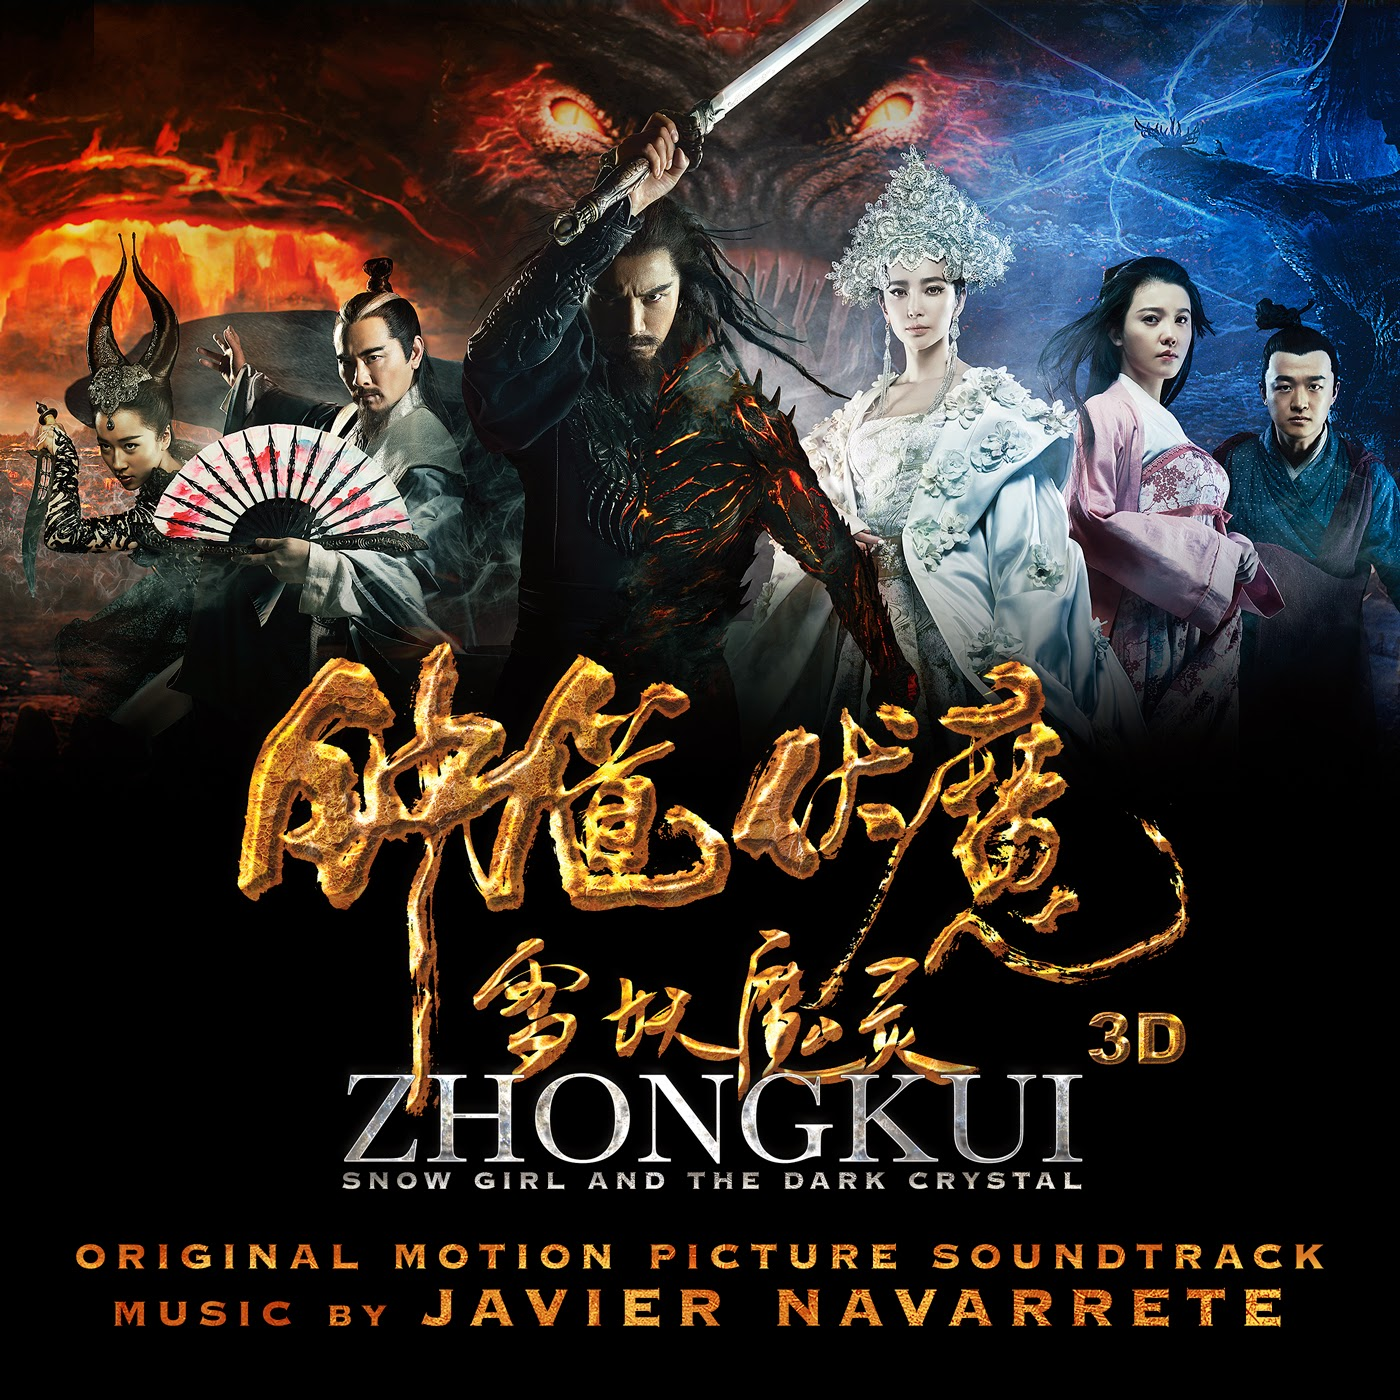 Zhong Kui: Snow Girl and the Dark Crystal (2015)